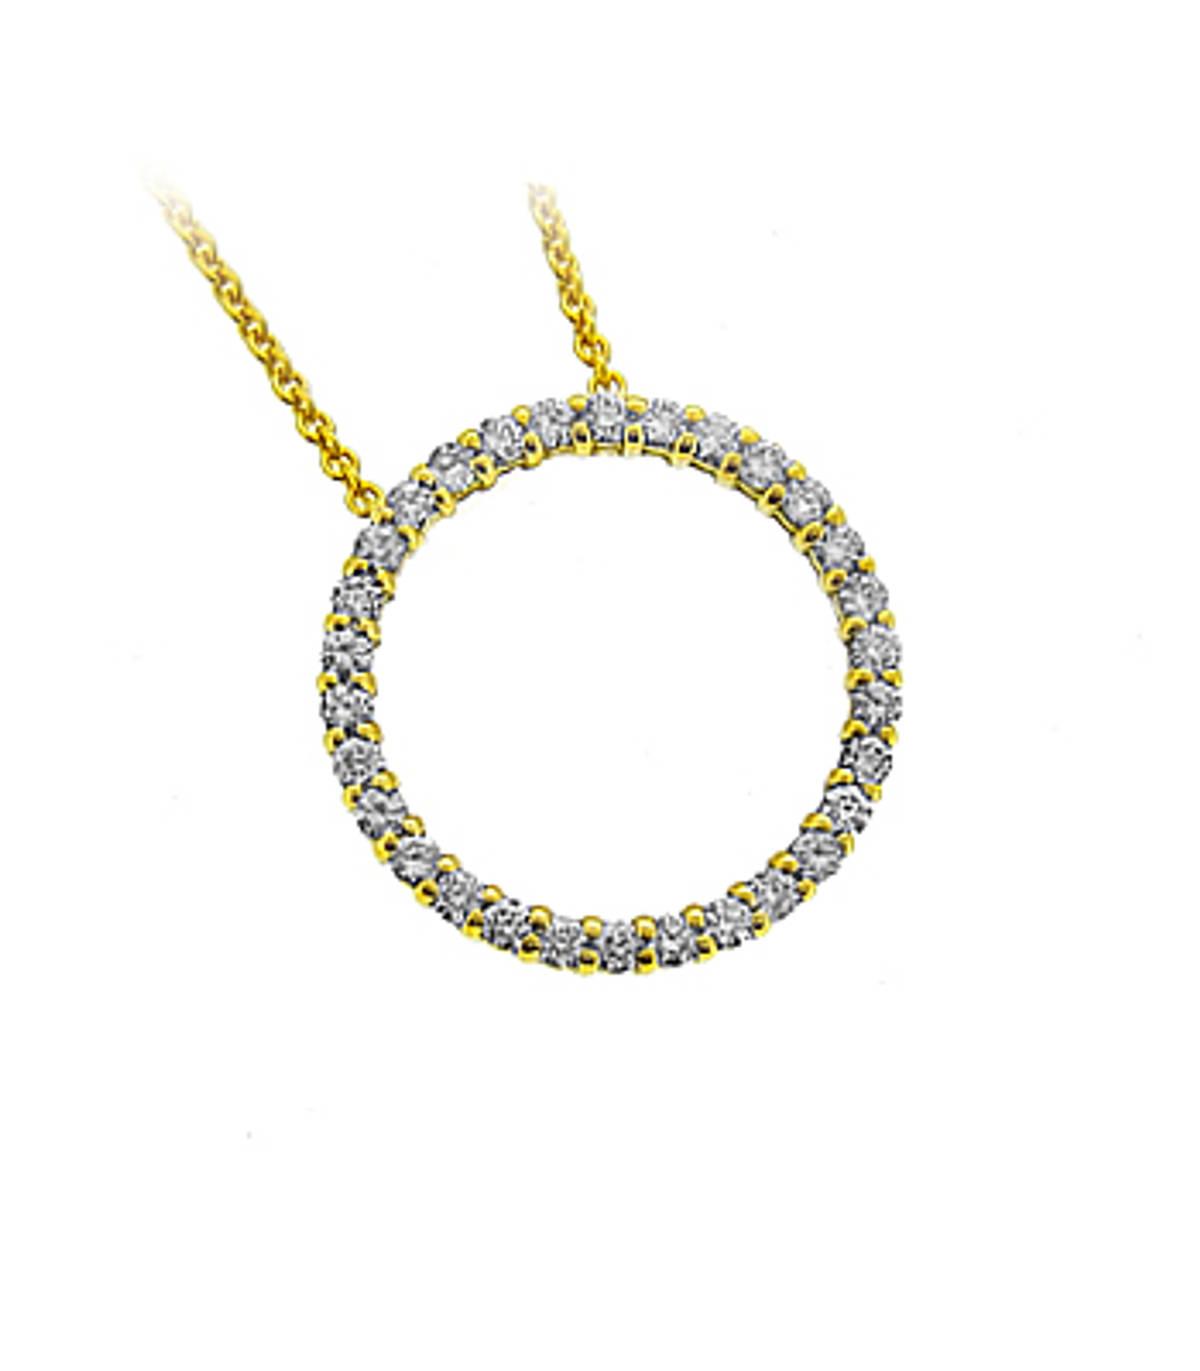 "18k Yellow Gold Brilliant Cut Diamond Circle Pendant On 18k Yellow Gold 18"" Chain Total Diamond Weight 0.37cts Metal: 18k Yellow Gold Pendant length 1.6cmPendant width 1.6cm"